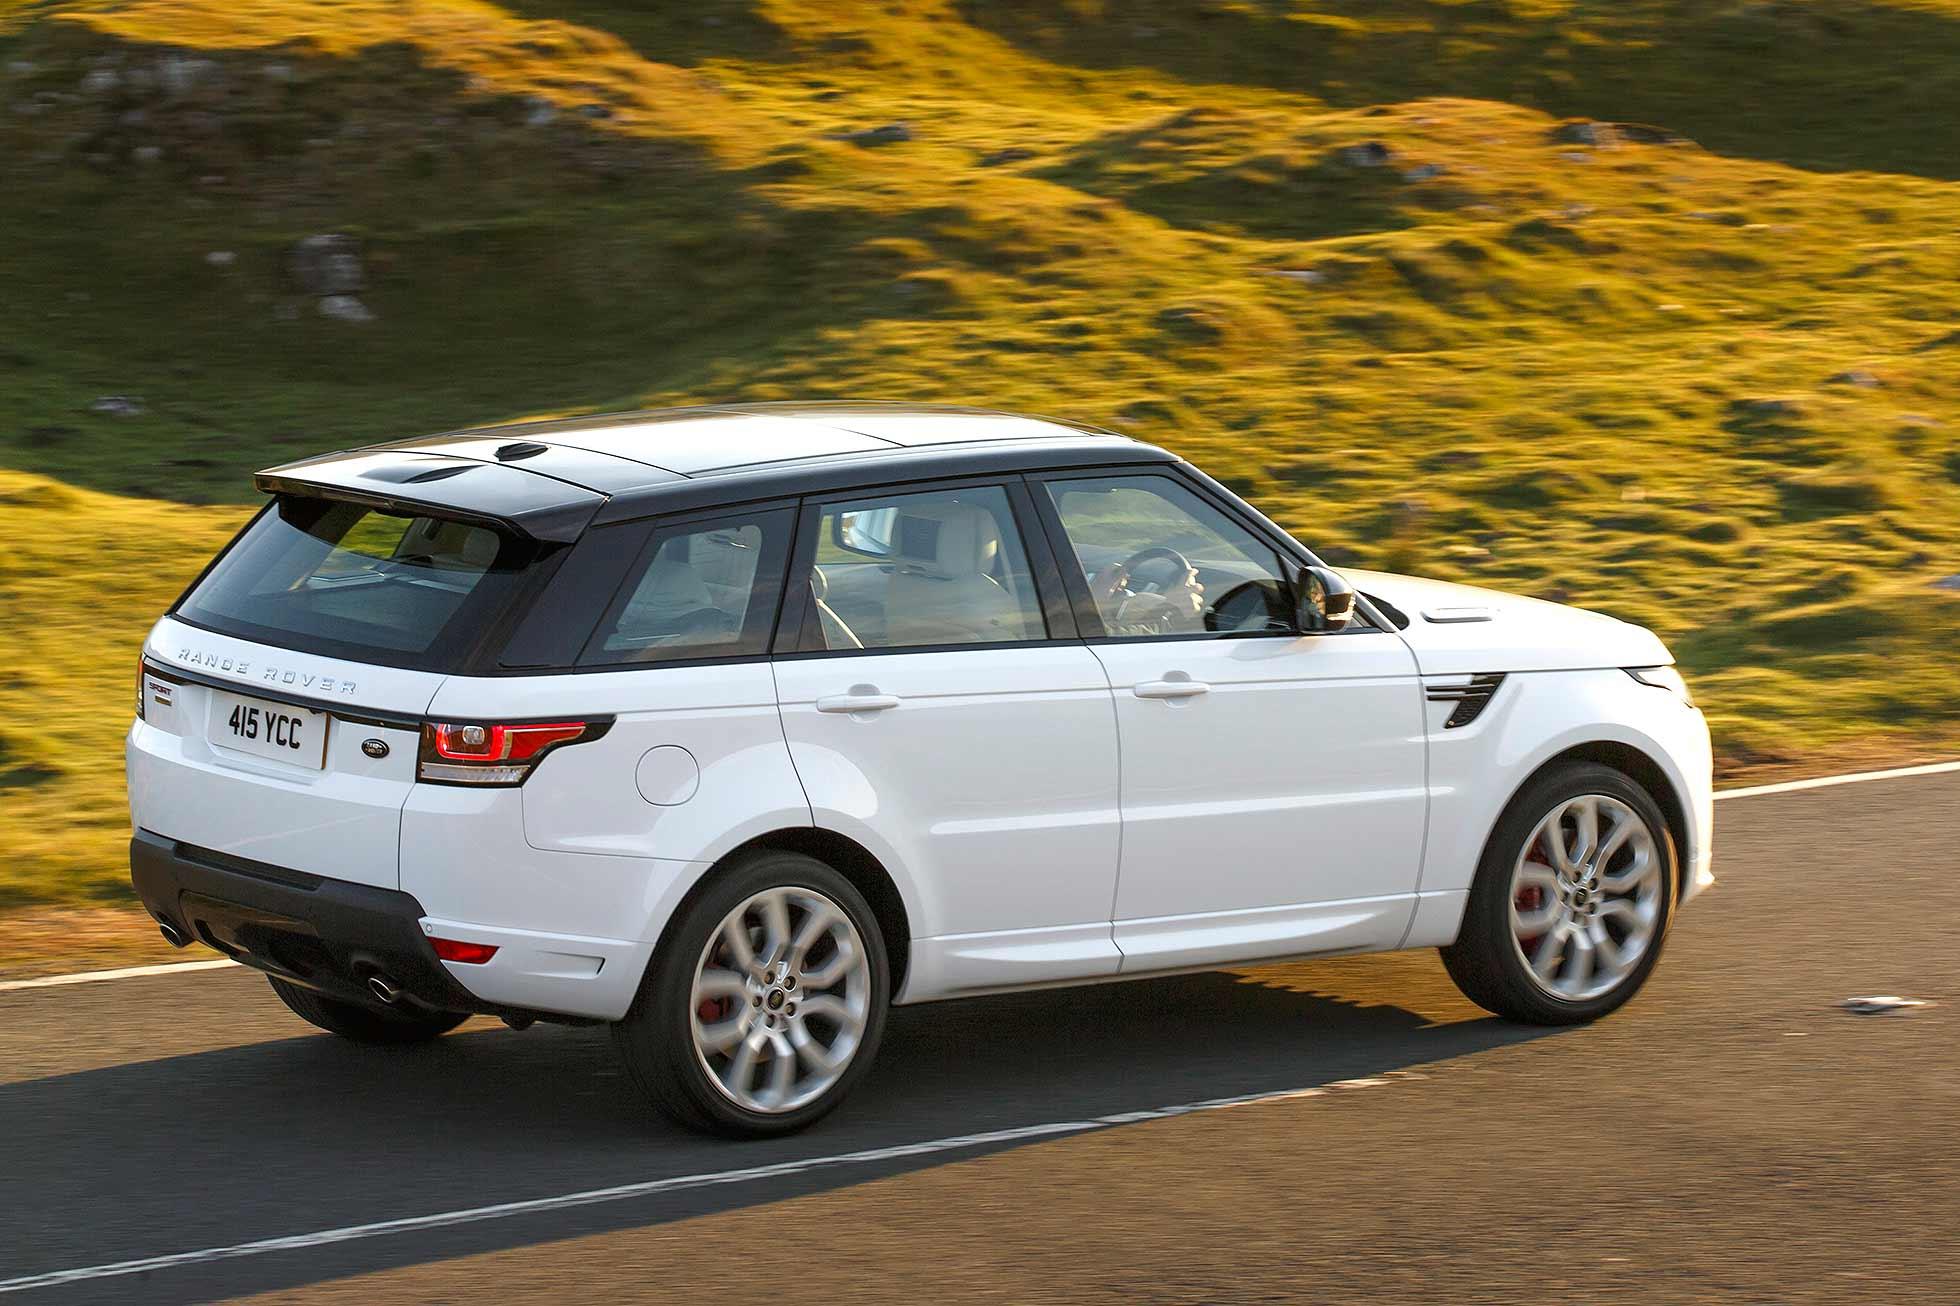 range rover sport supercharged review 2015 road test motoring. Black Bedroom Furniture Sets. Home Design Ideas